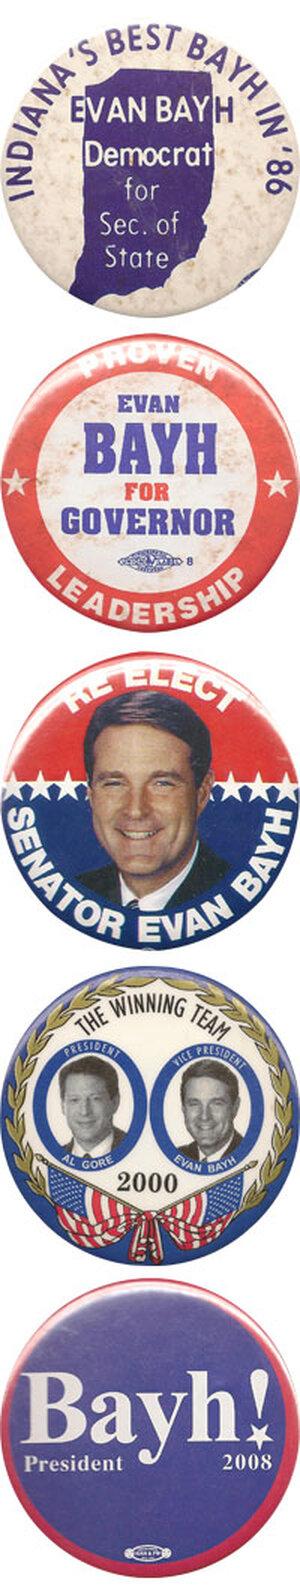 Senator Evan Bayh Retires.